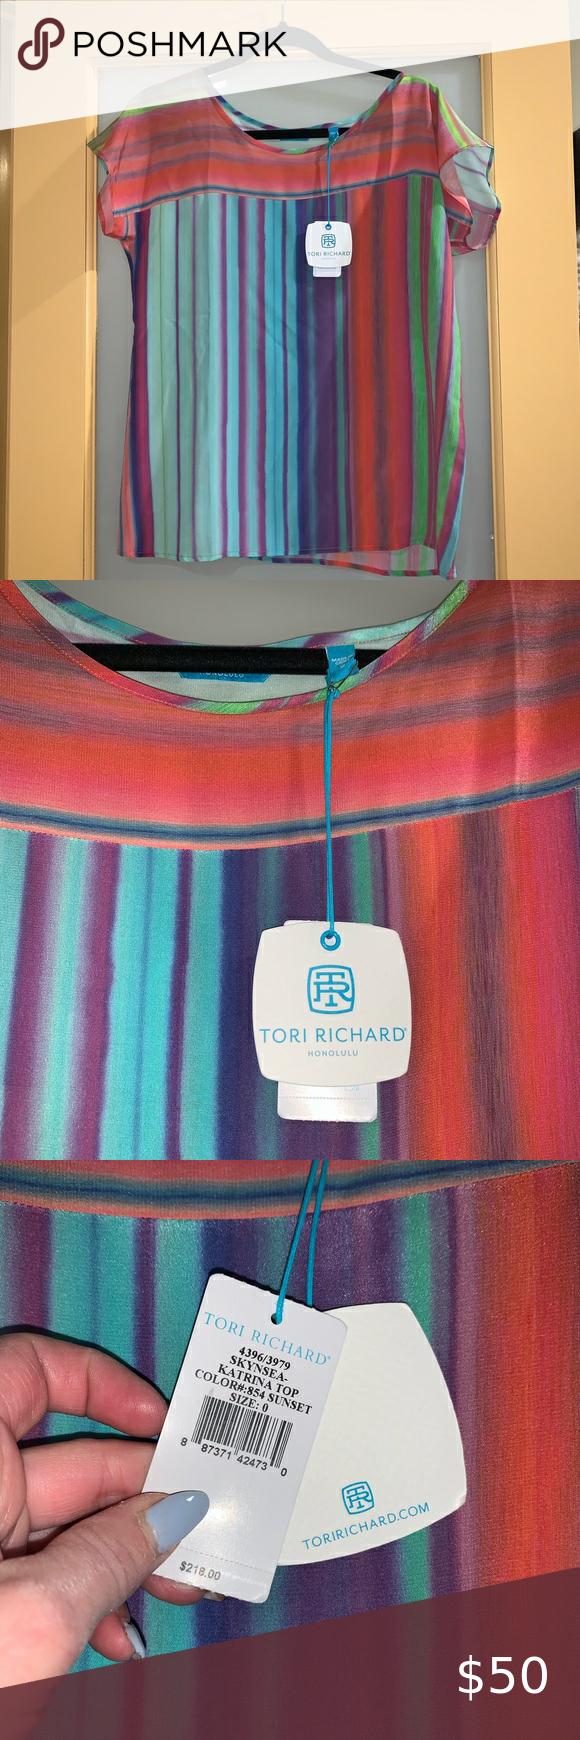 Tori Richard Skynsea Katrina Silk Stripe Top 0 Tori Richard Honolulu Skynsea Katrina 100 Silk Striped Shirt Size 0 In 2020 Stripe Tunic Top Tori Richard Stripe Tunic